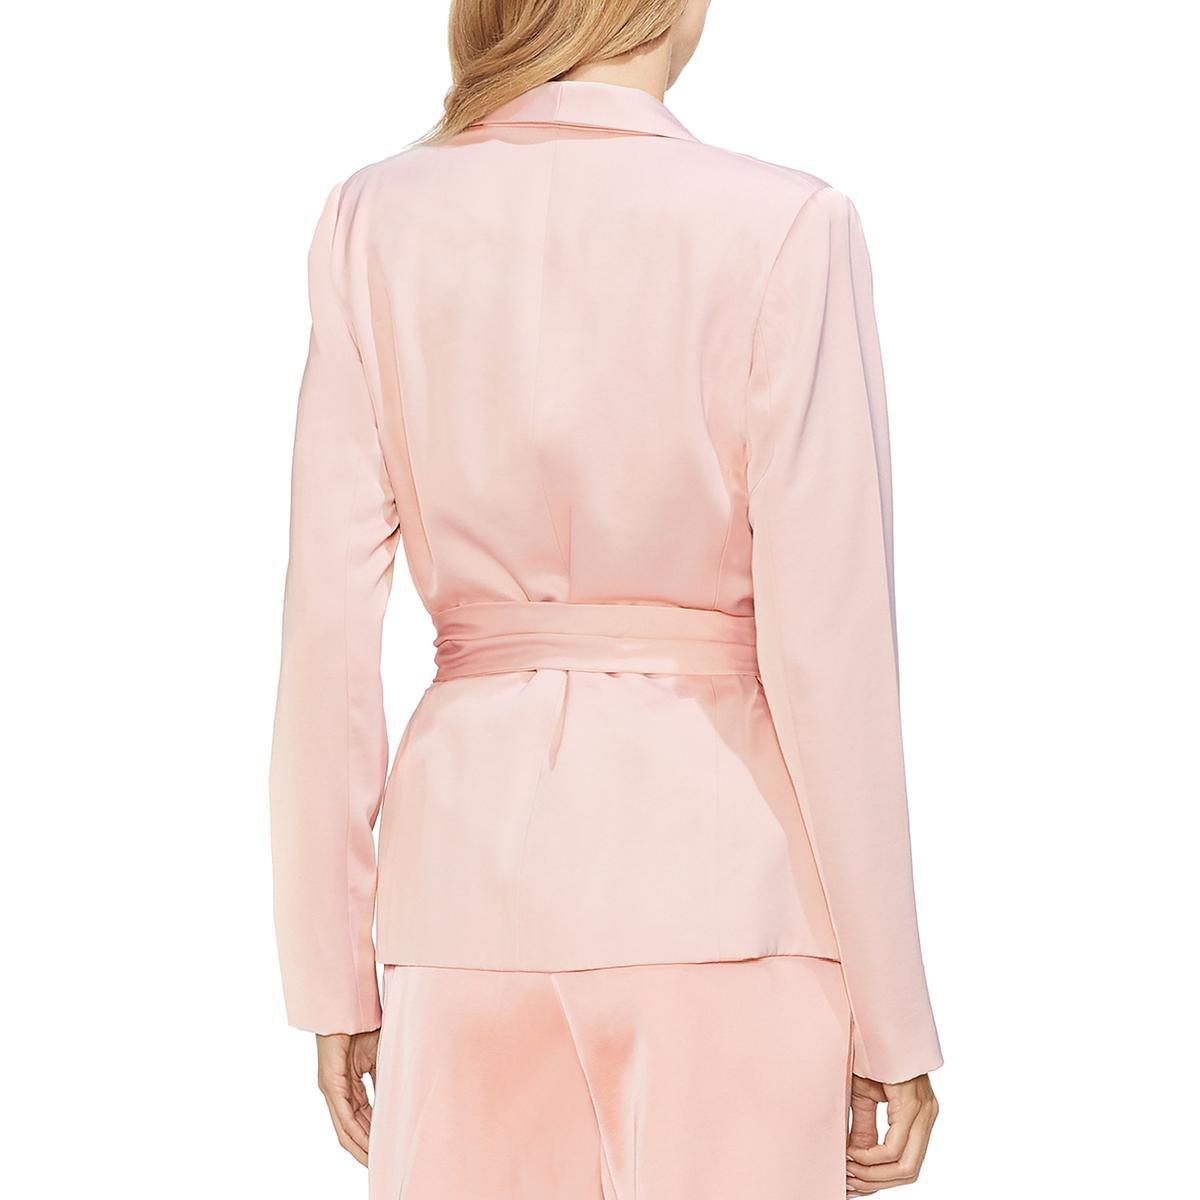 Vince Camuto Womens Pink Satin Shawl Collar Open-Front Blazer Jacket 2 BHFO 4177